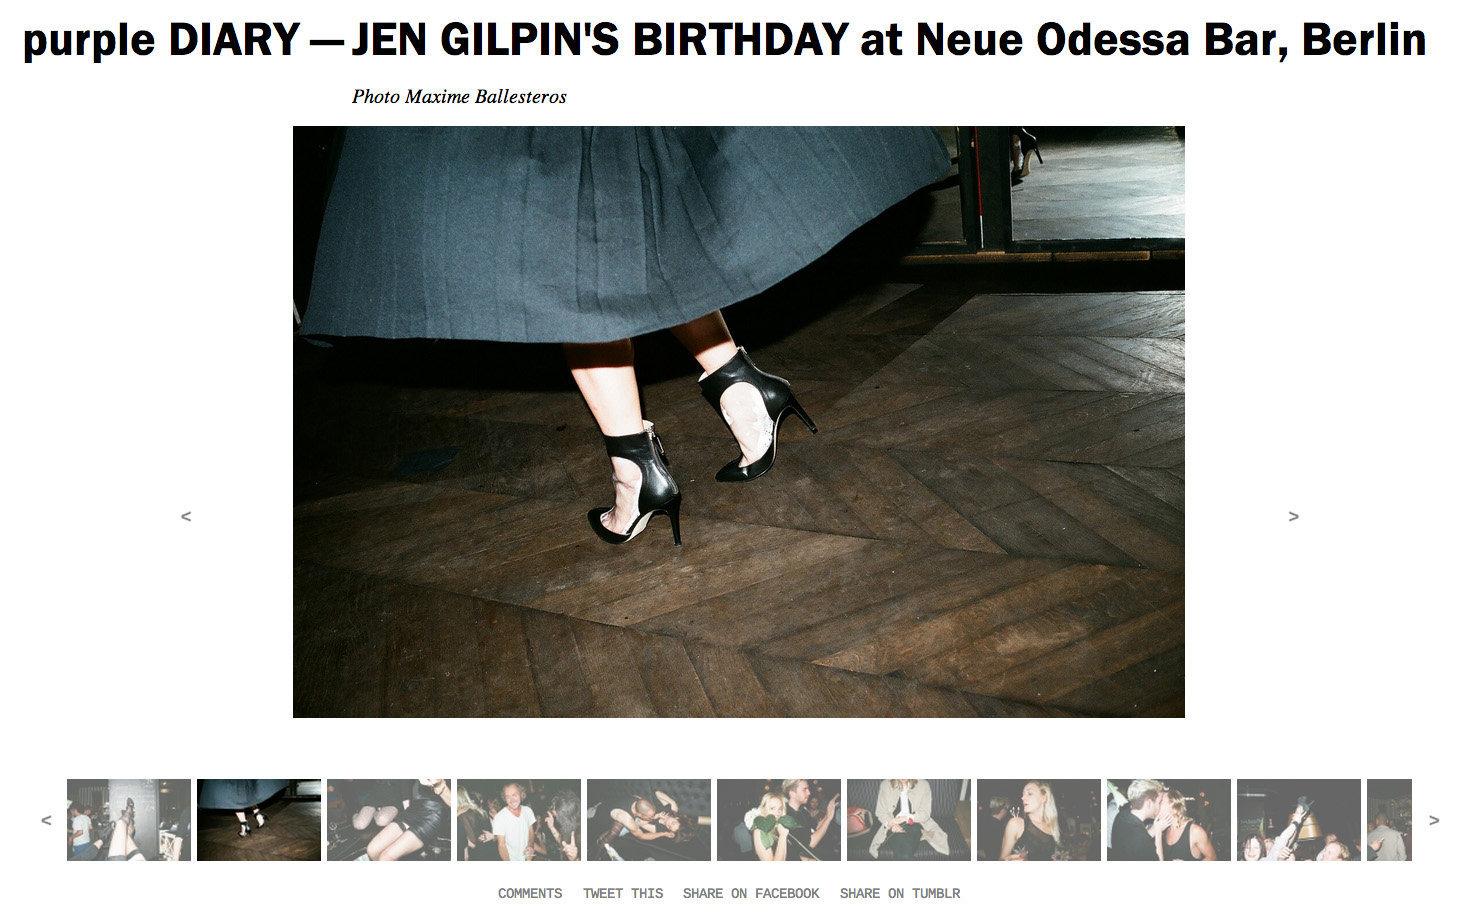 purple DIARY   JEN GILPIN S BIRTHDAY at Neue Odessa Bar  Berlin.jpg